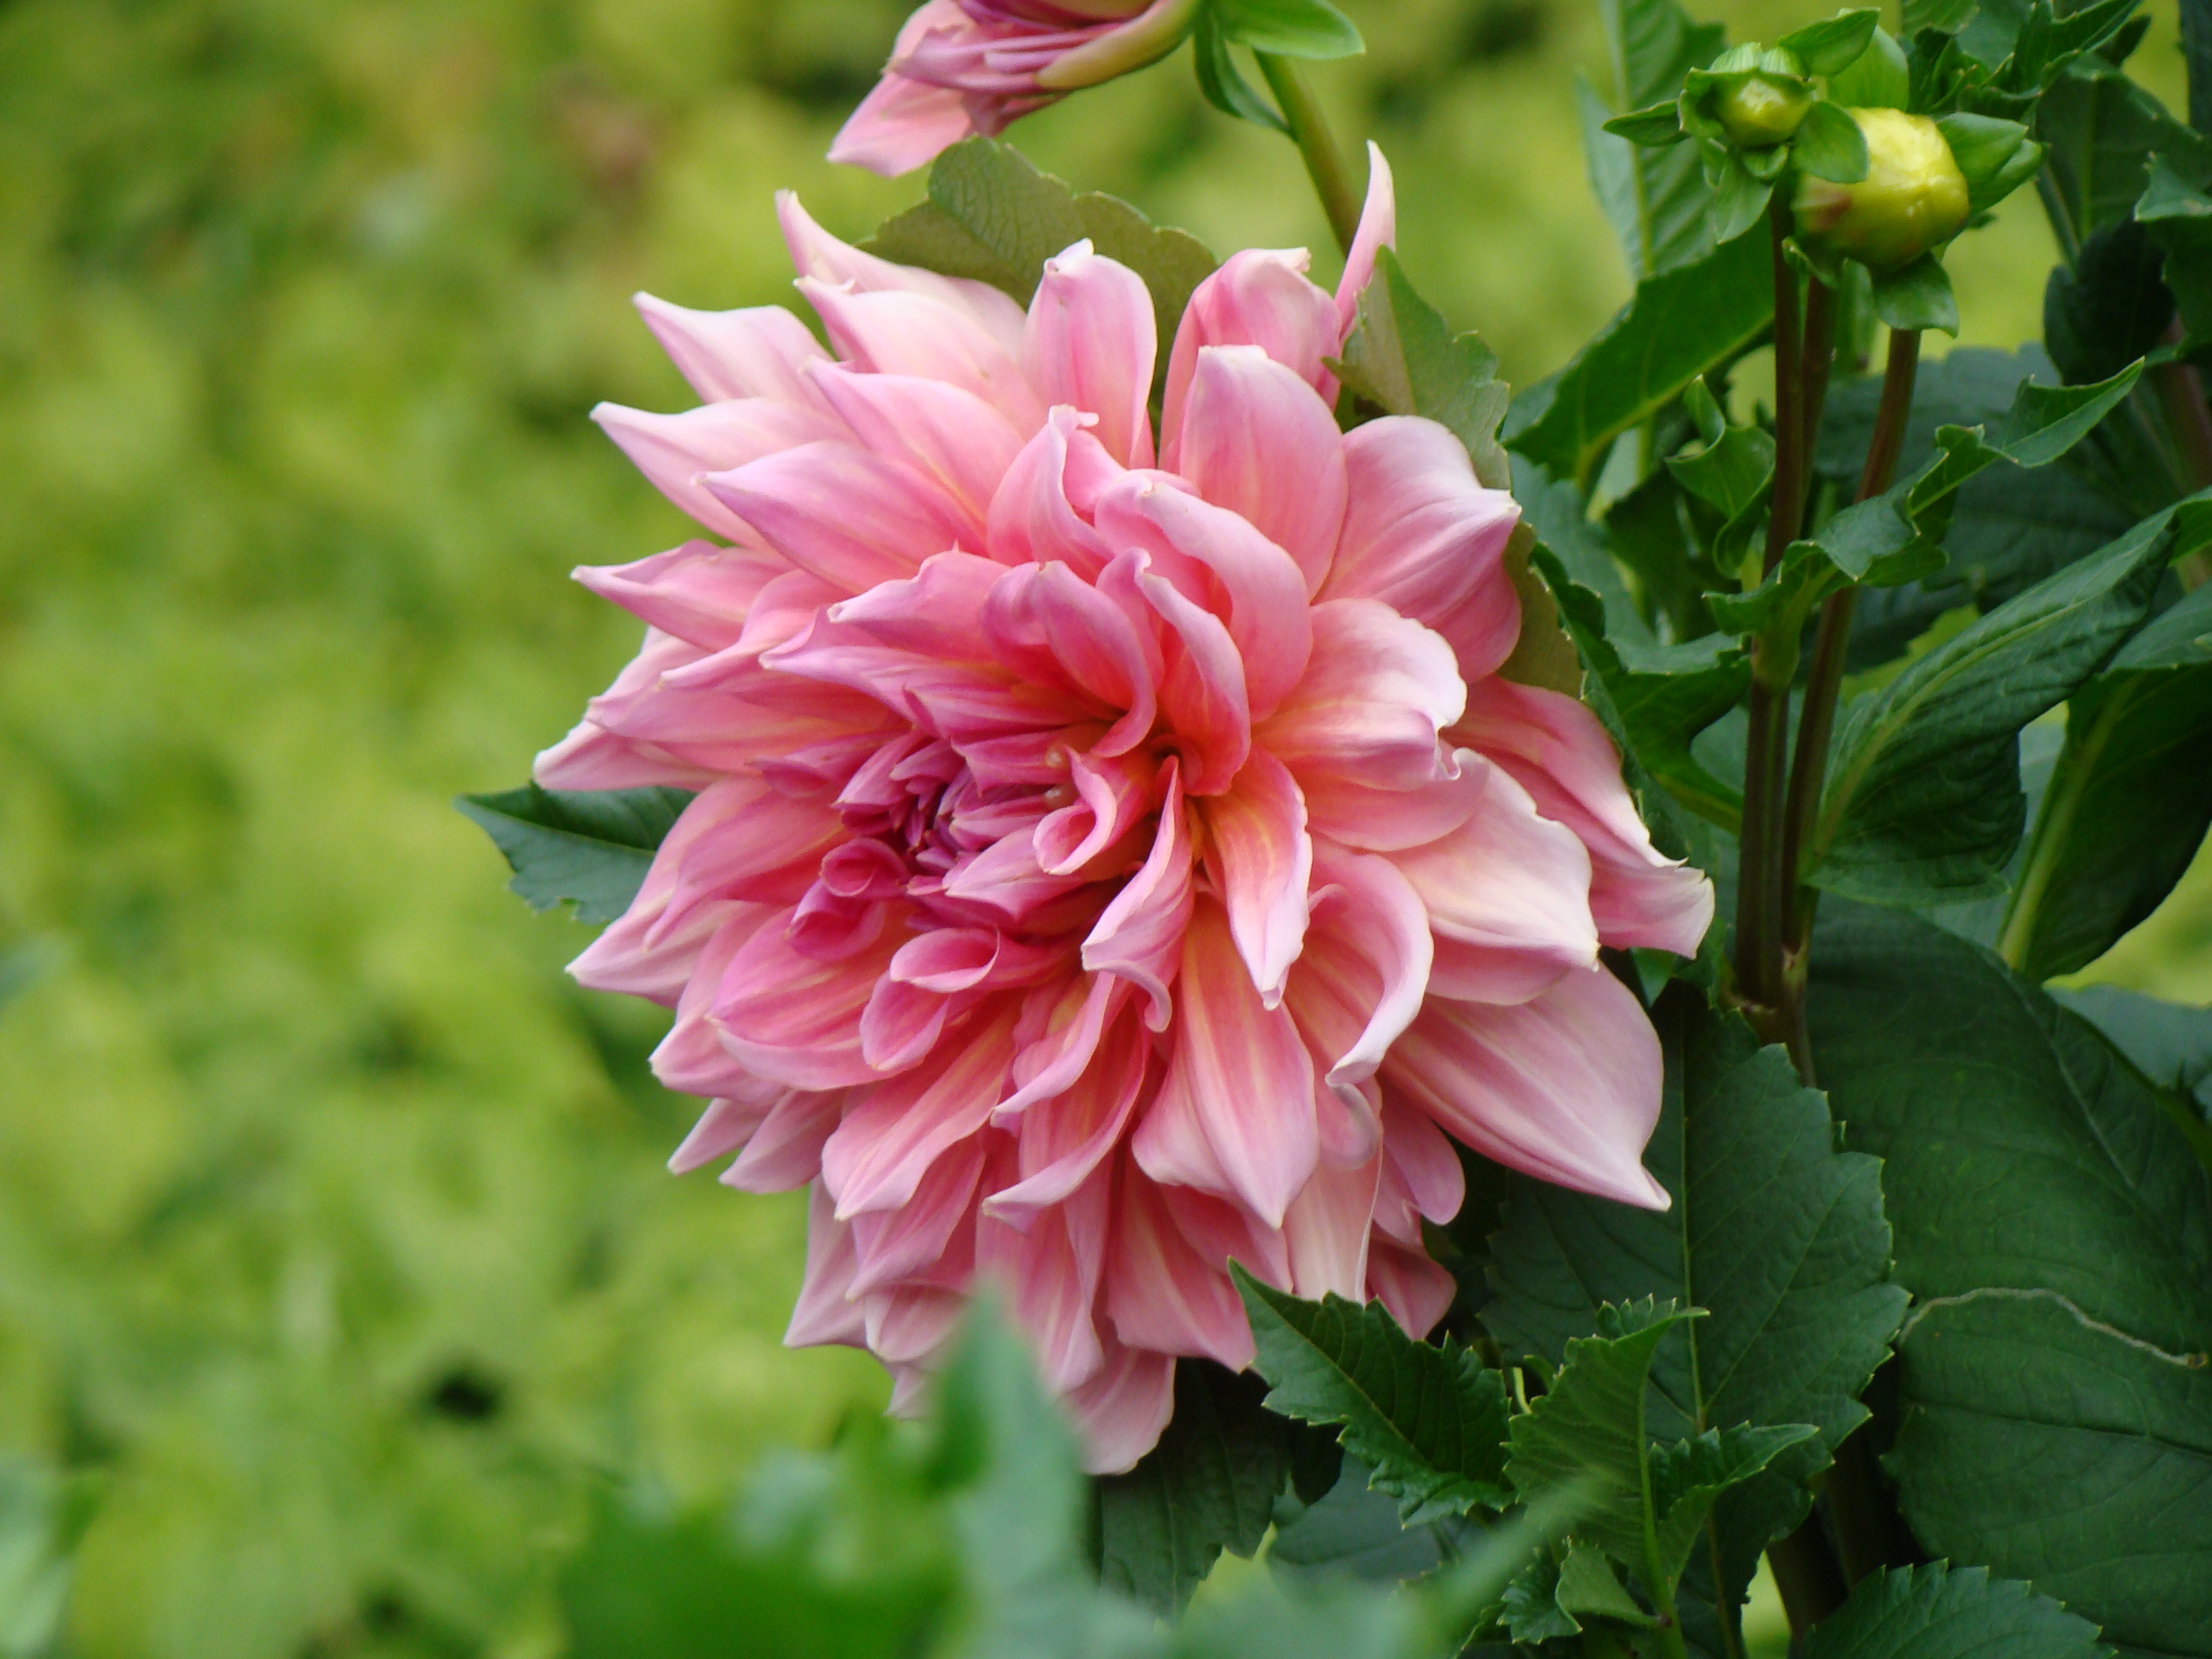 георгин, цветы, цветок